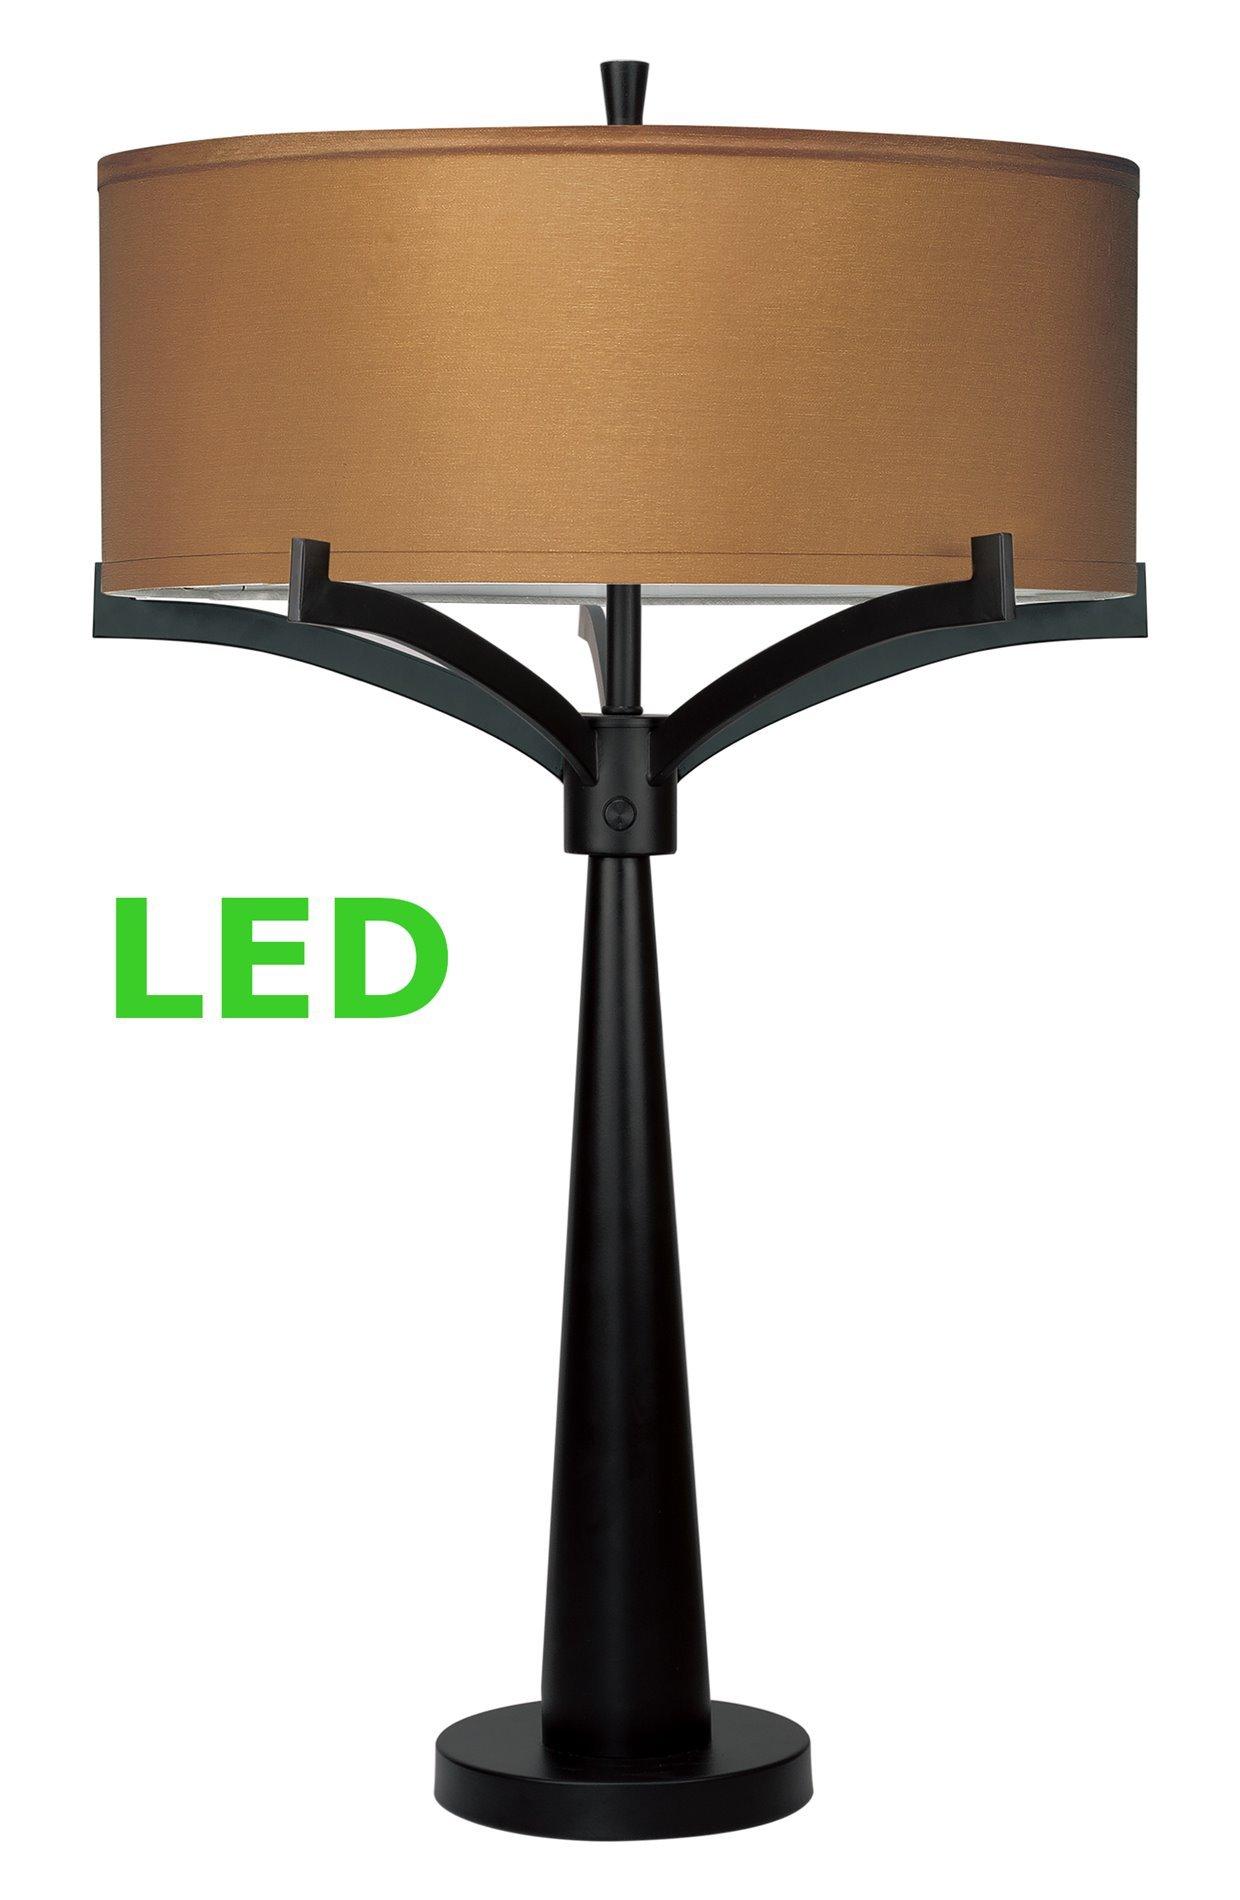 Revel Olympia Large 31'' 2-Light Modern LED Table Lamp, 12W LED (6W x 2), Energy Efficient / Eco-Friendly + Golden Bronze Shade, Black Finish